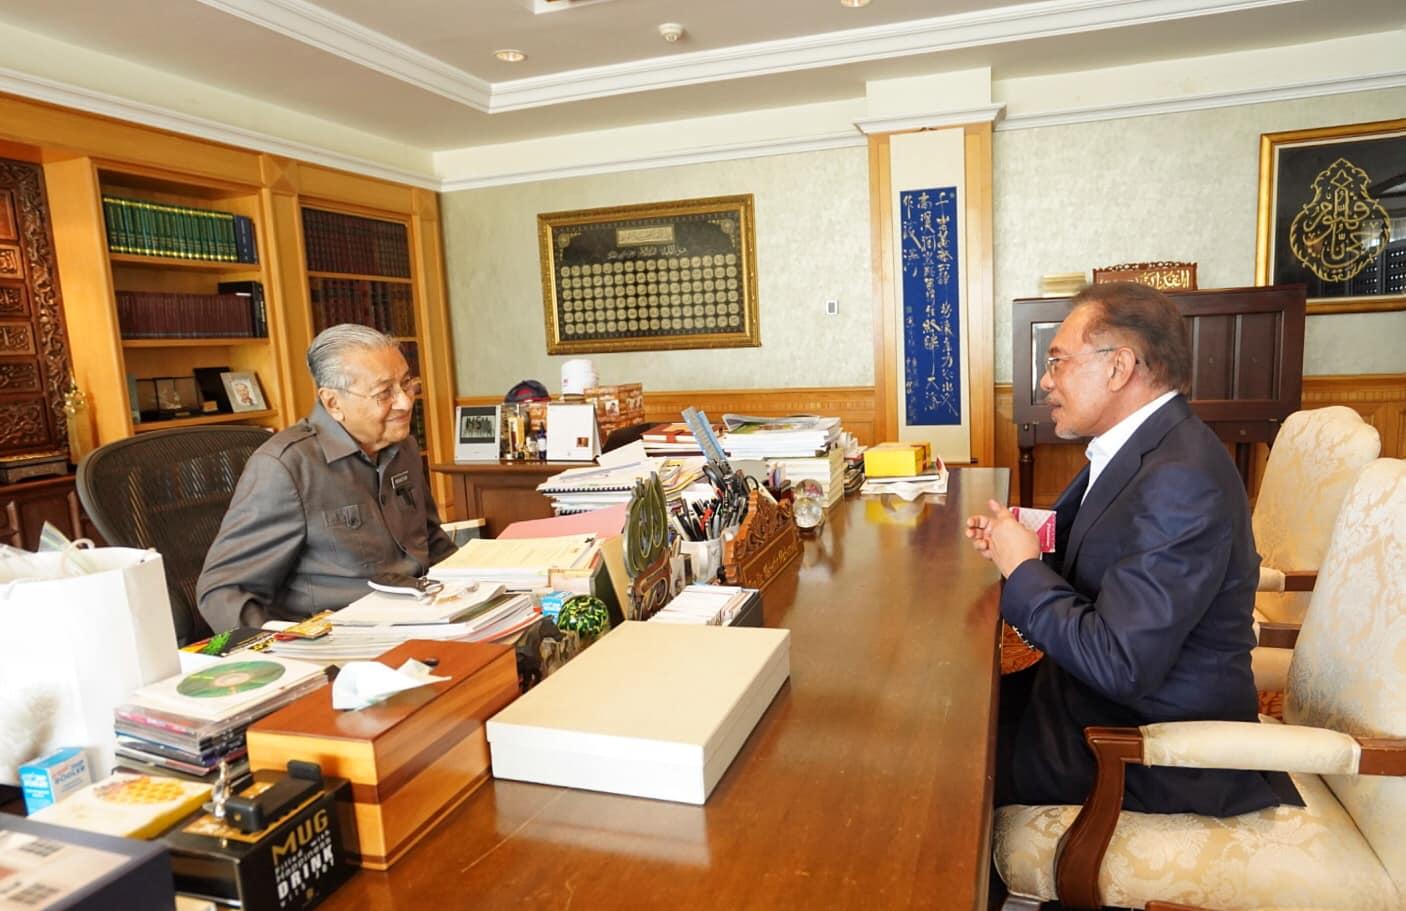 Image from Anwar Ibrahim/Facebook